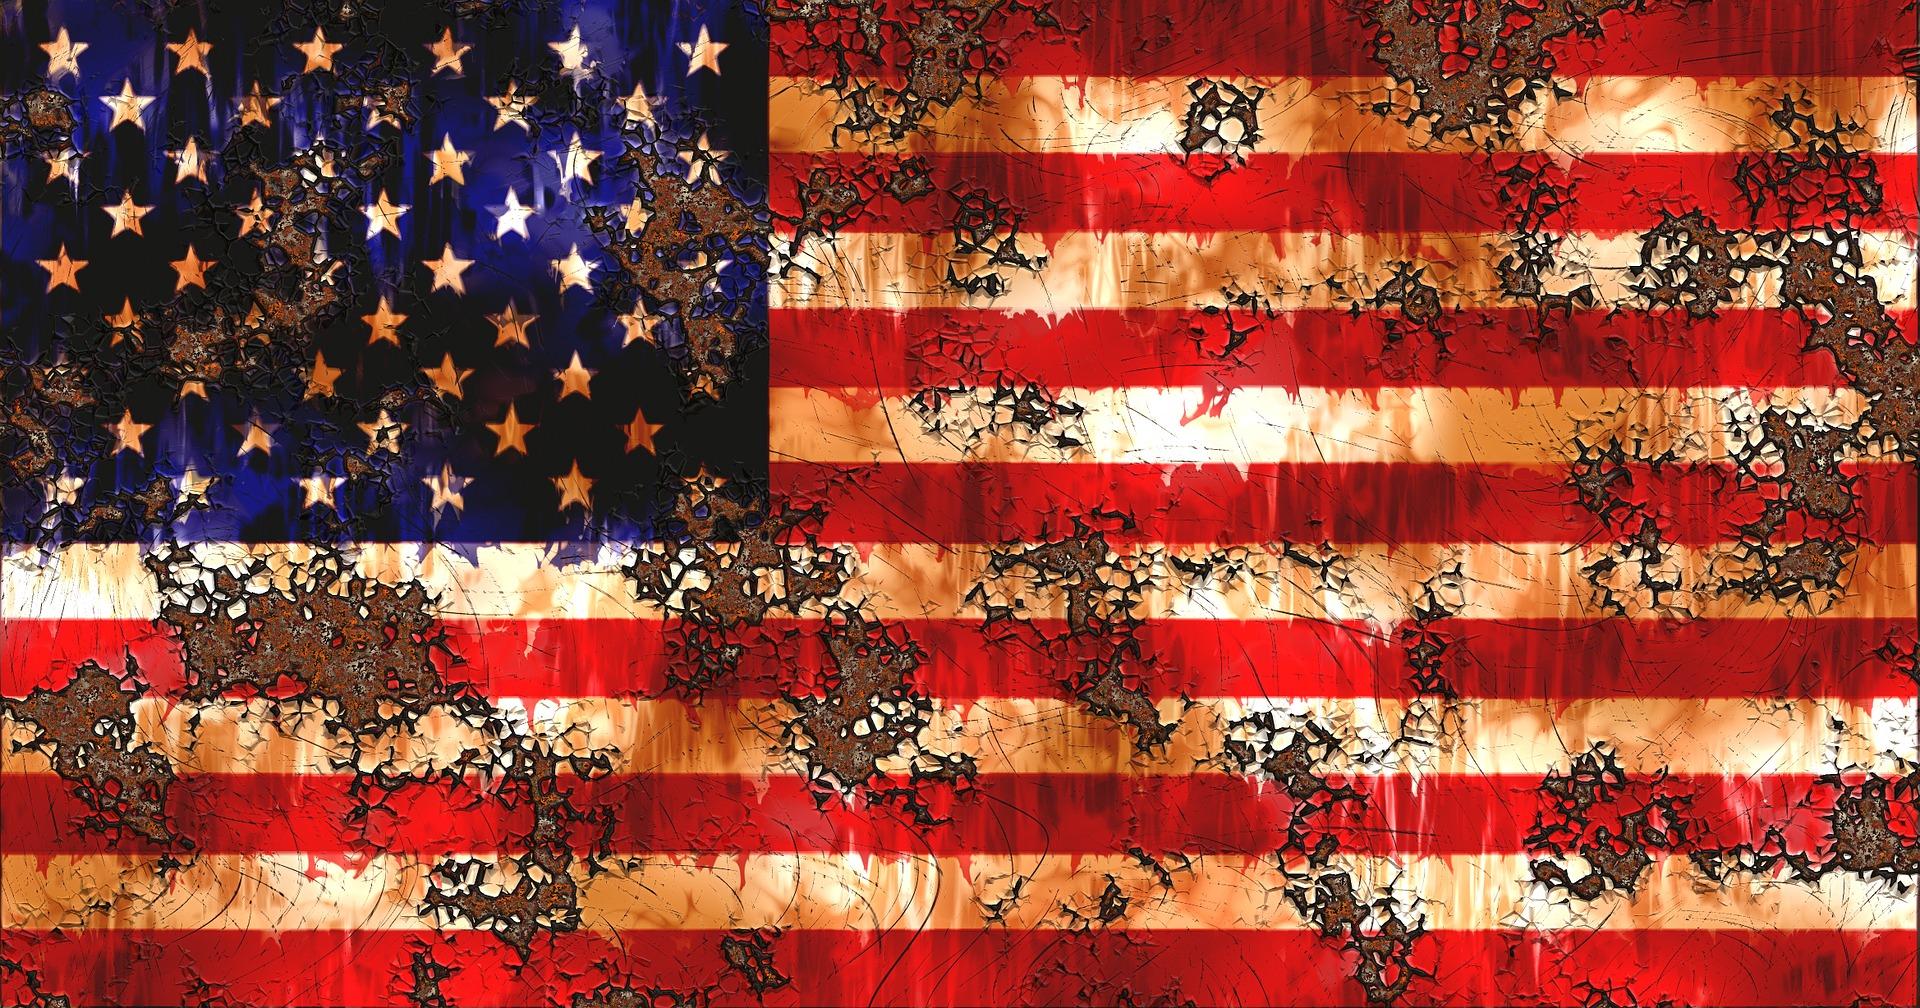 Patriotism of a Different Kind